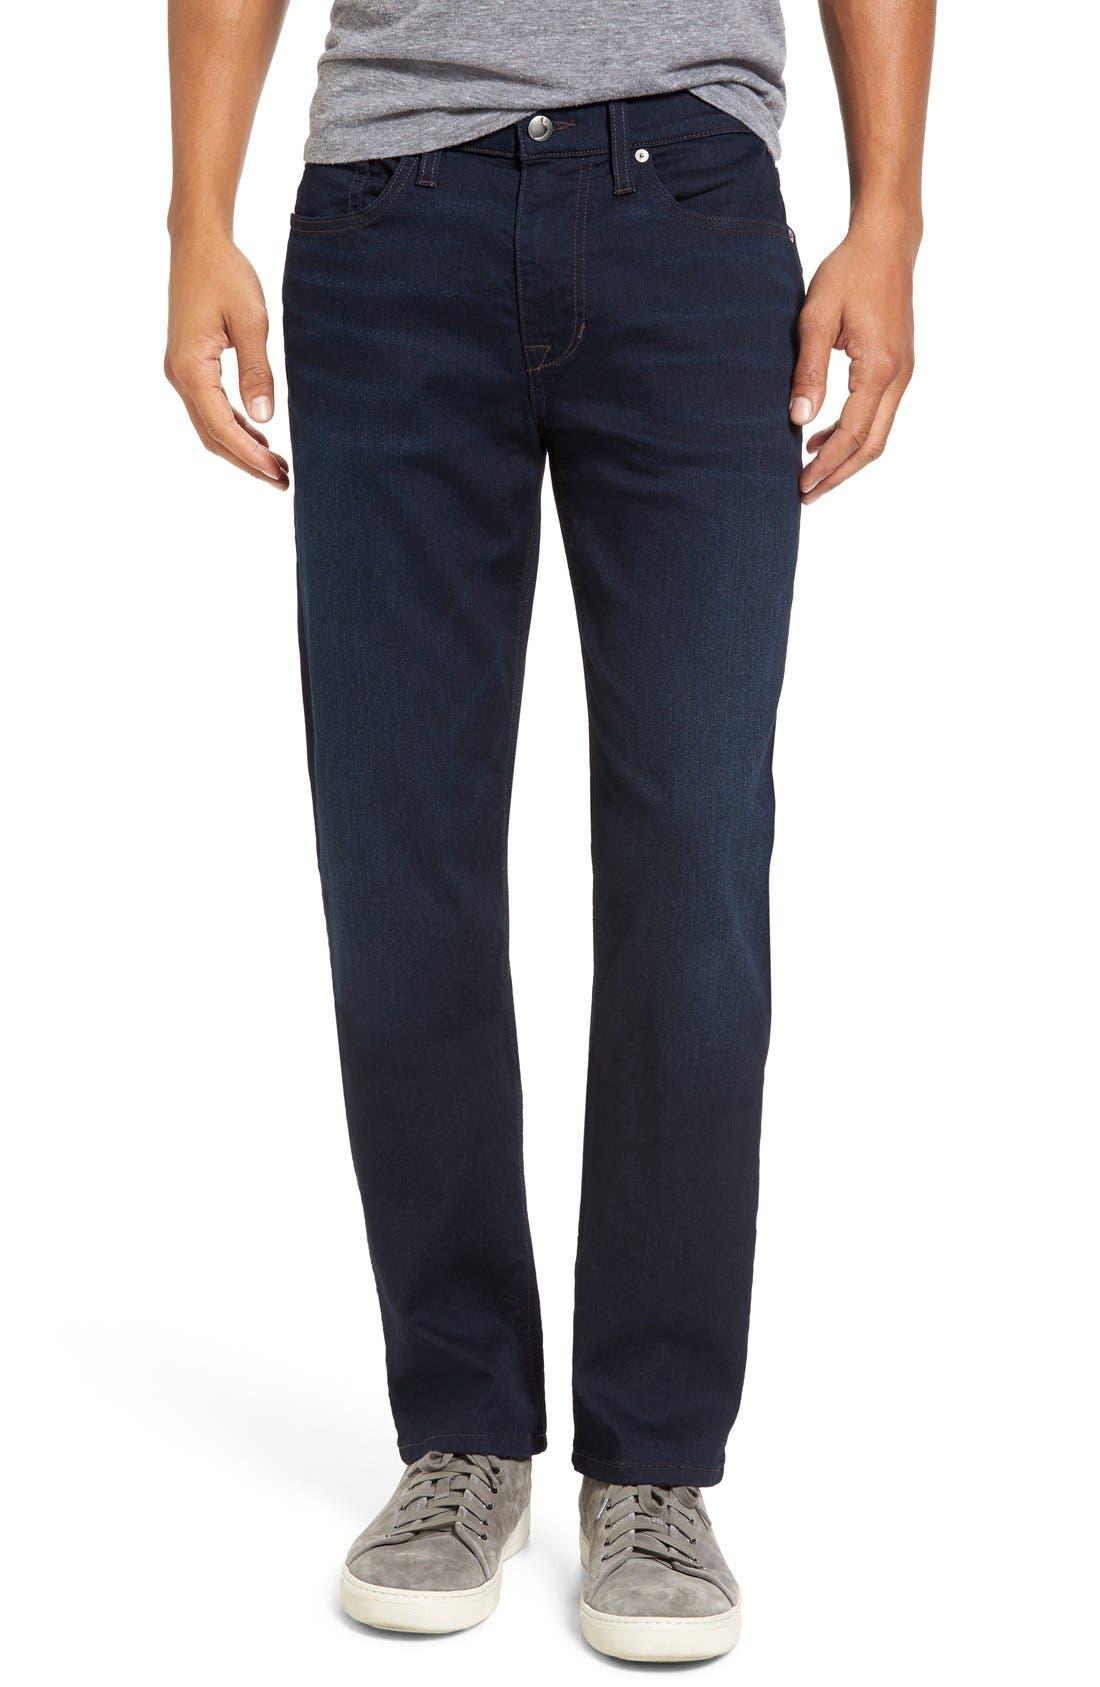 JOE'S Brixton Kinetic Slim Straight Leg Jeans